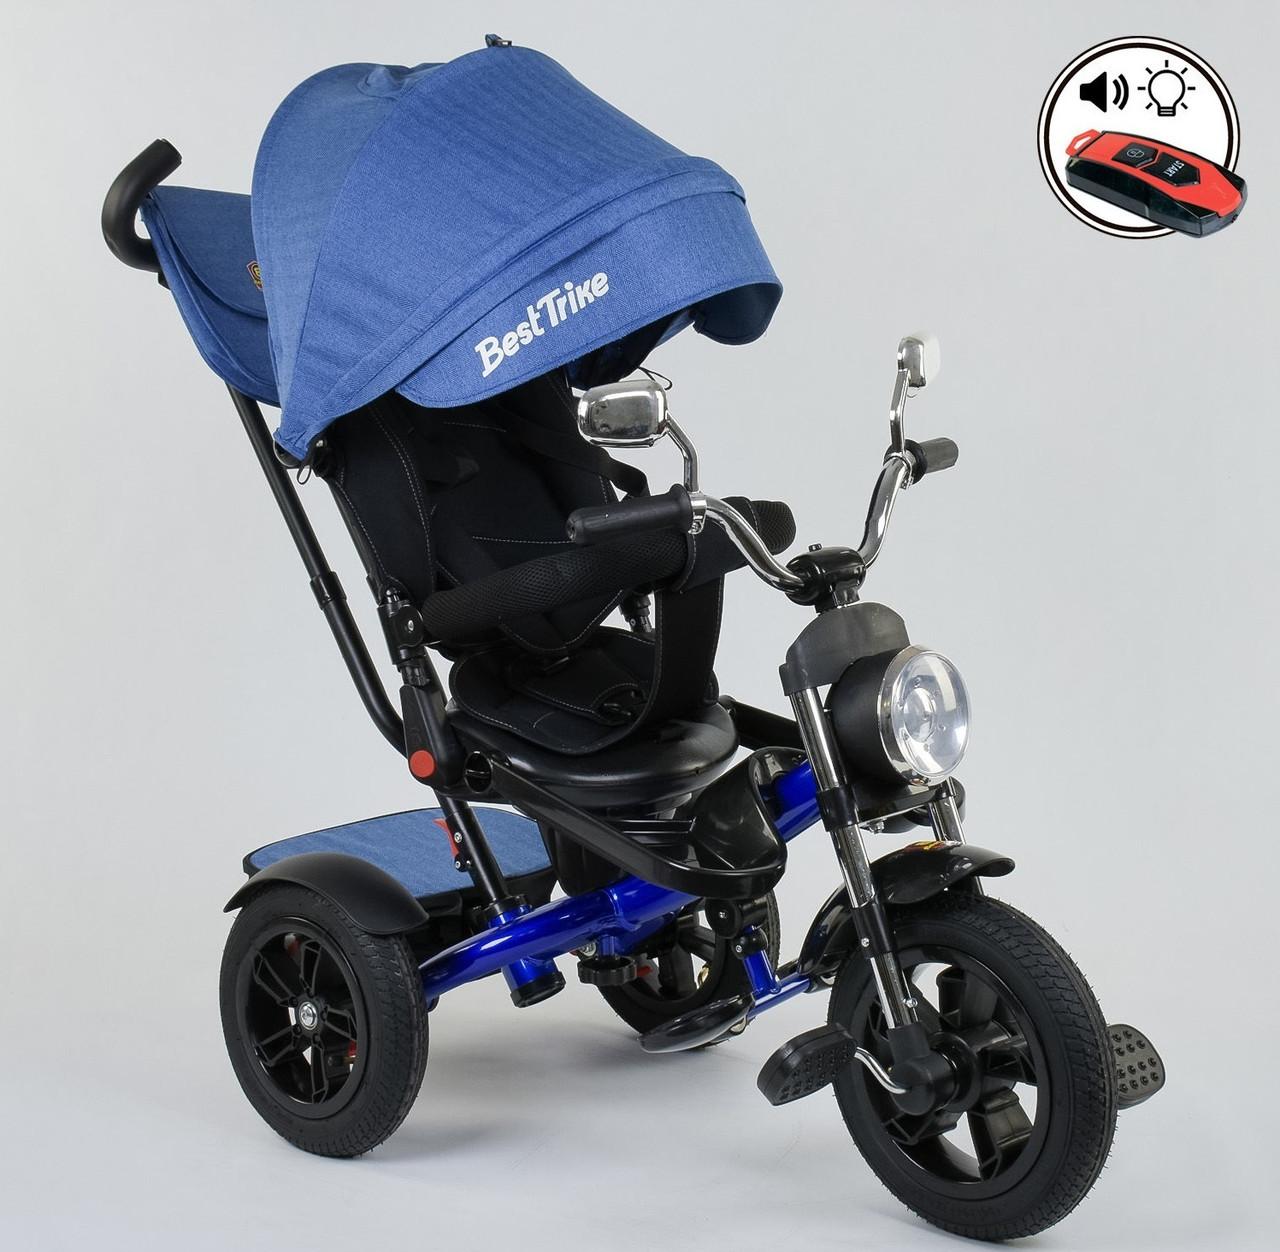 Best Trike Велосипед Best Trike 4490 - 3525 Blue (4490)